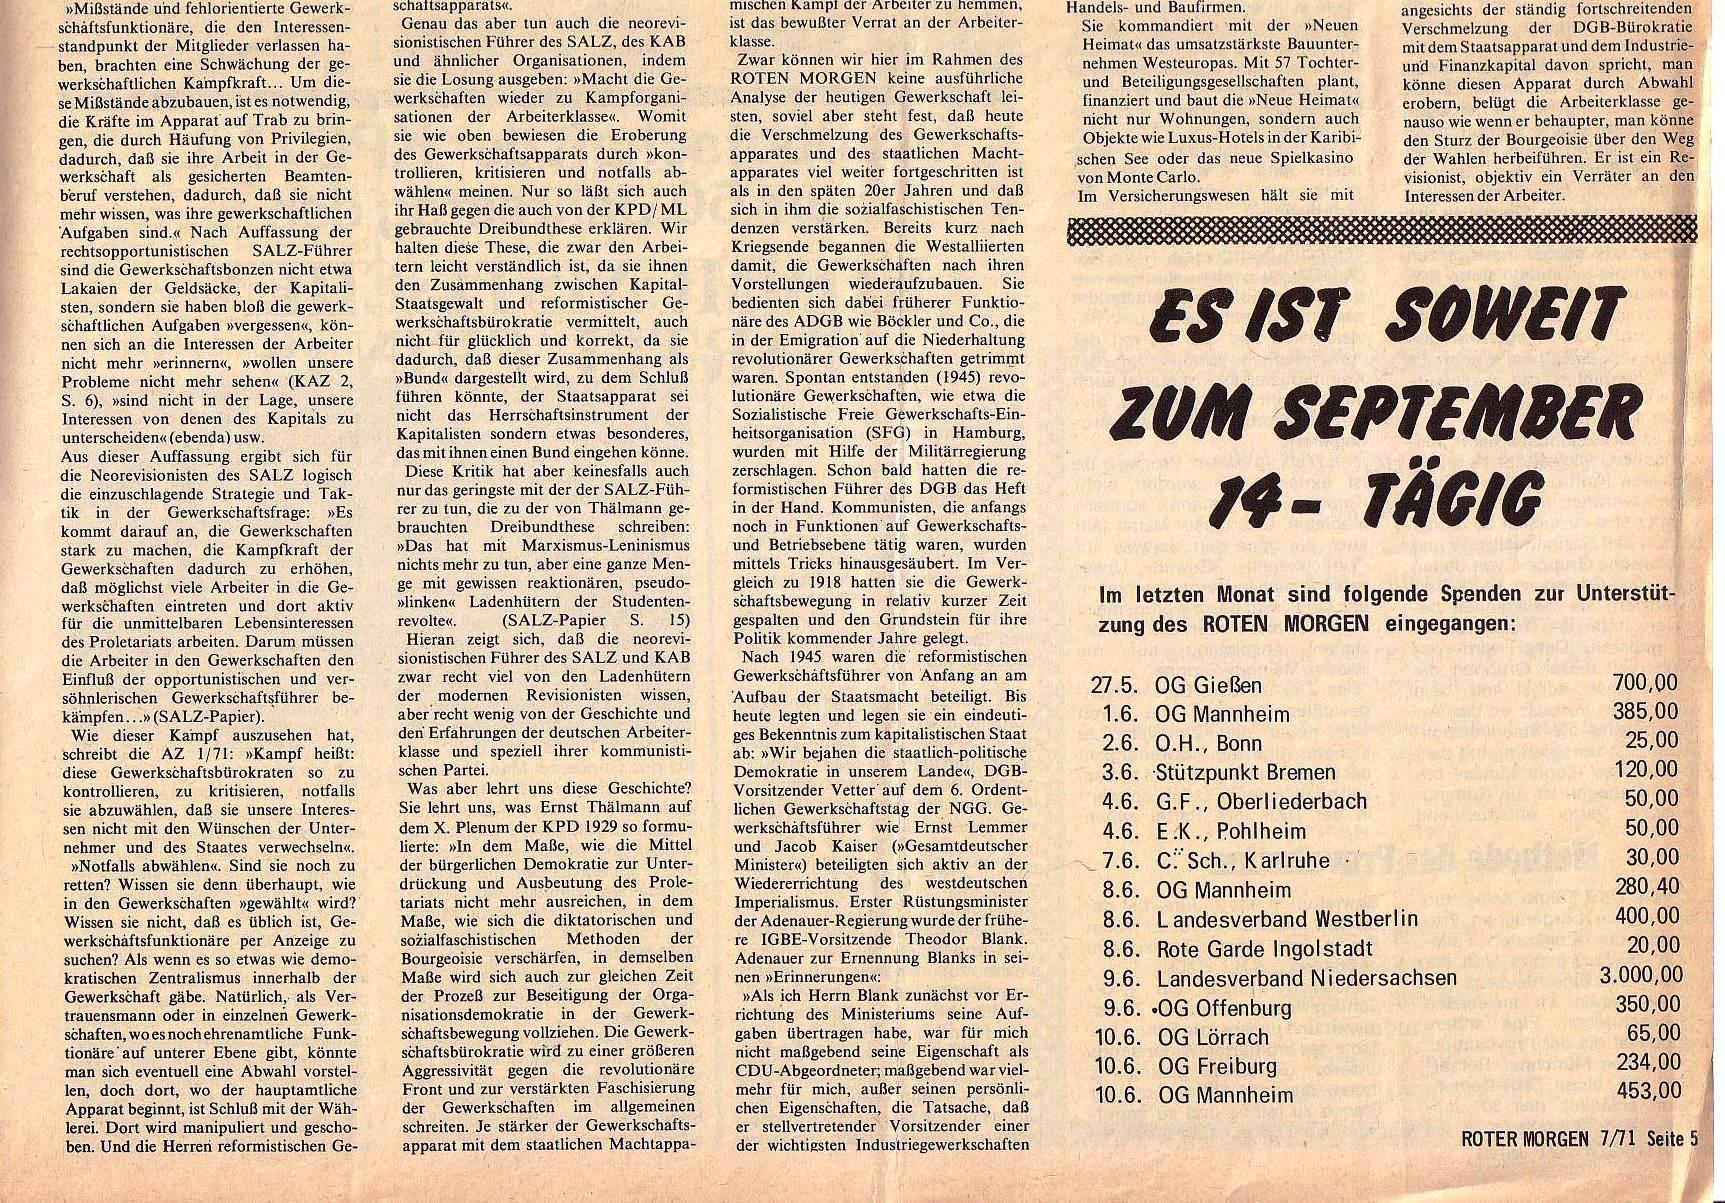 Roter Morgen, 5. Jg., Juli 1971, Nr. 7, Seite 5b